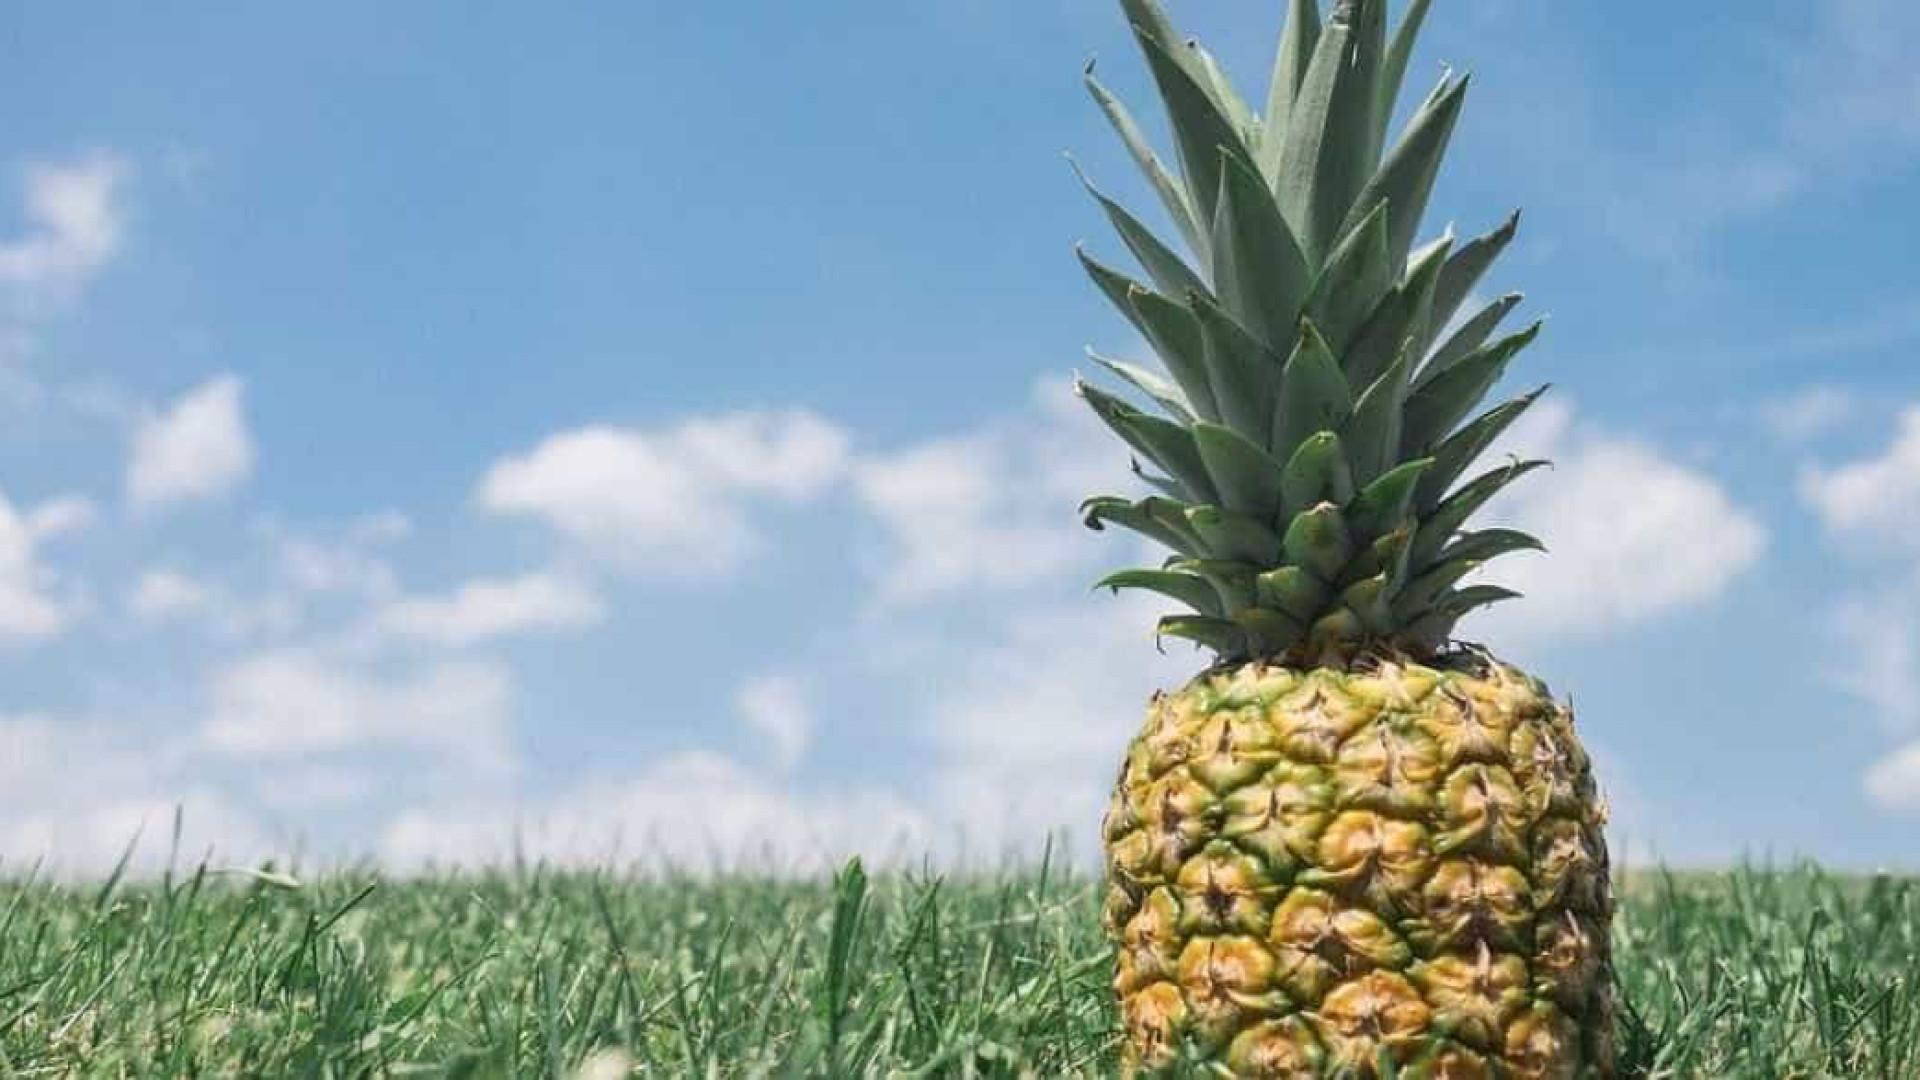 Bons motivos para comer mais abacaxi